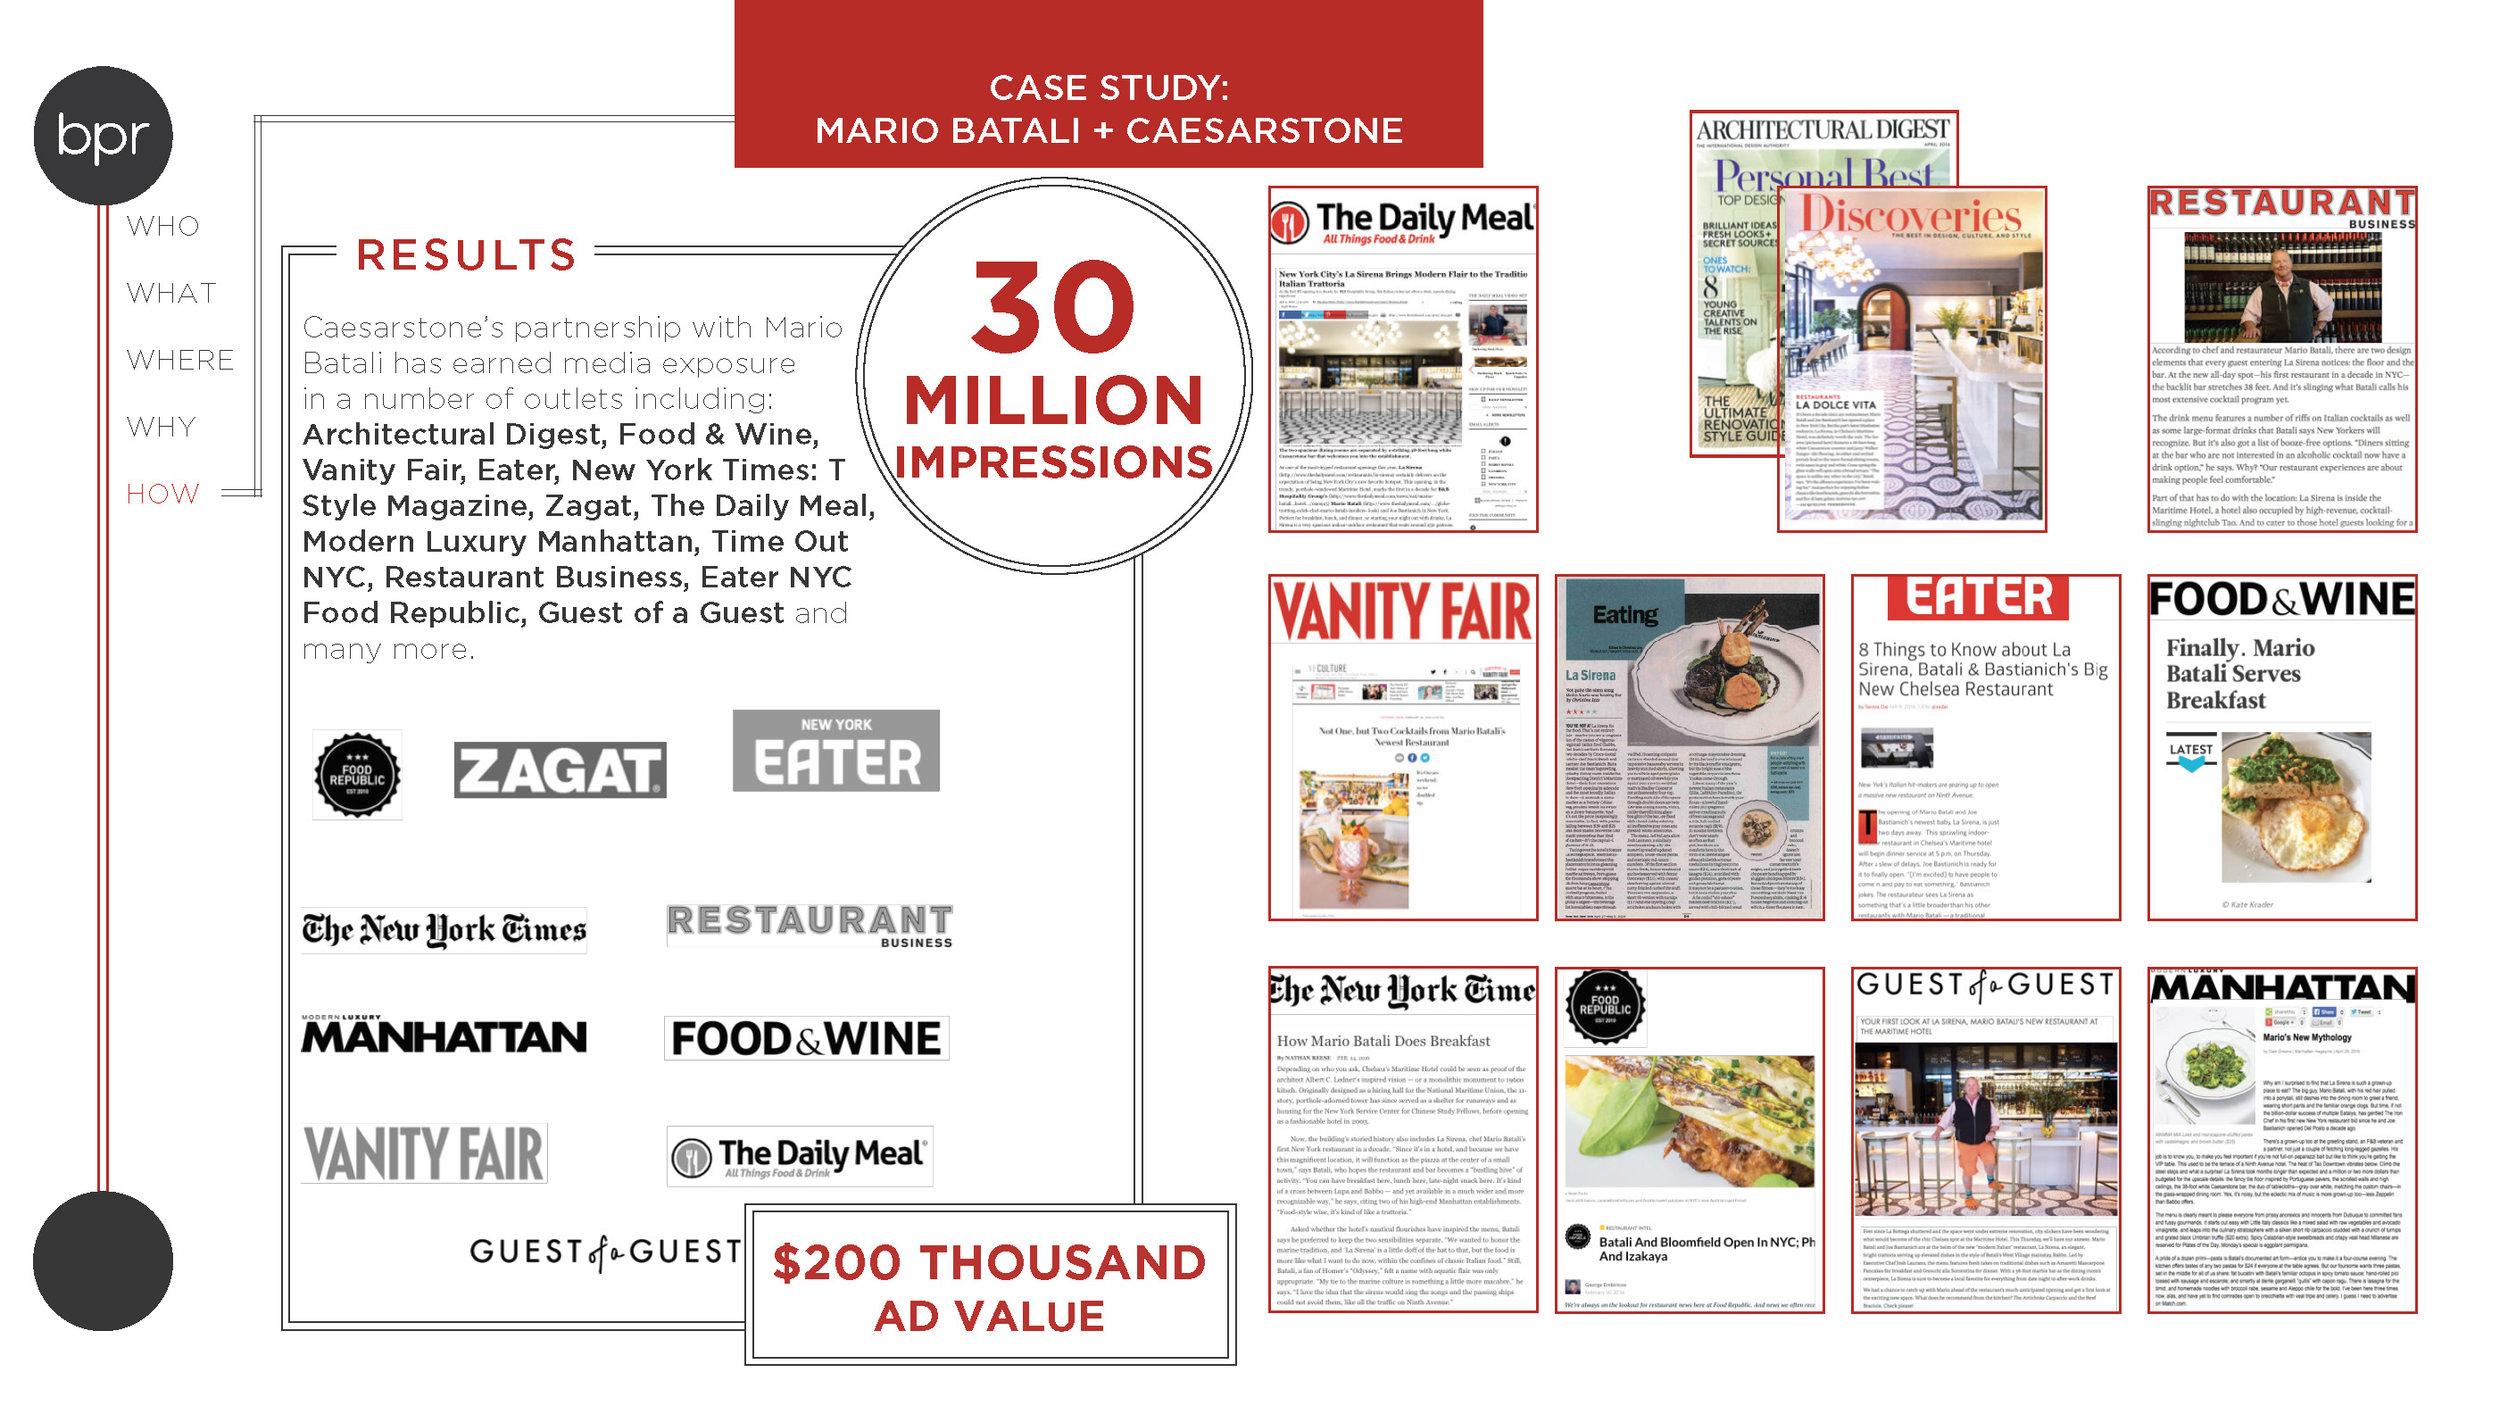 Caesarstone-Mario Batali Case Study_Page_3.jpg